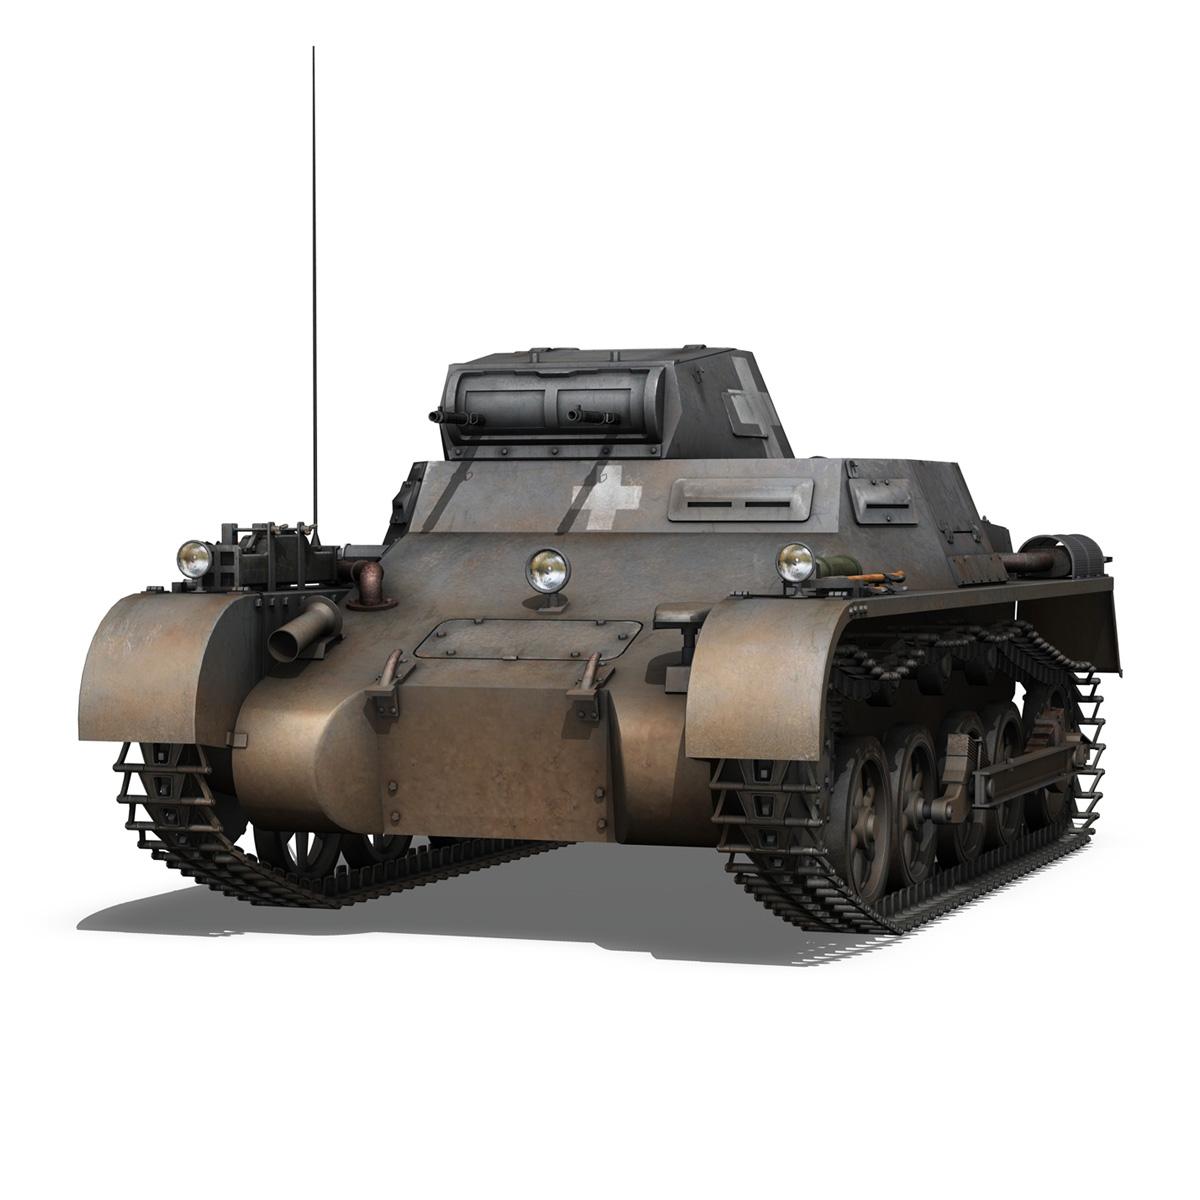 pzkpfw 1 - Panzer 1 - ausf. a - 22 3d modell 3ds fbx c4d lwo obj 186927